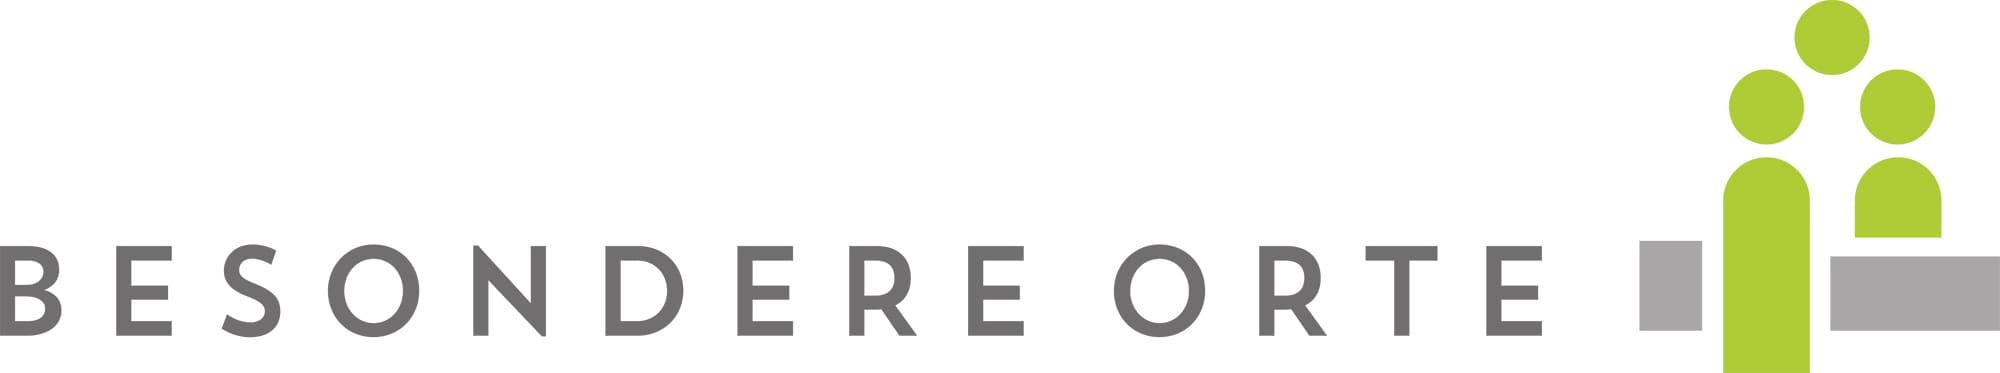 BESONDERE ORTE Umweltforum Berlin GmbH